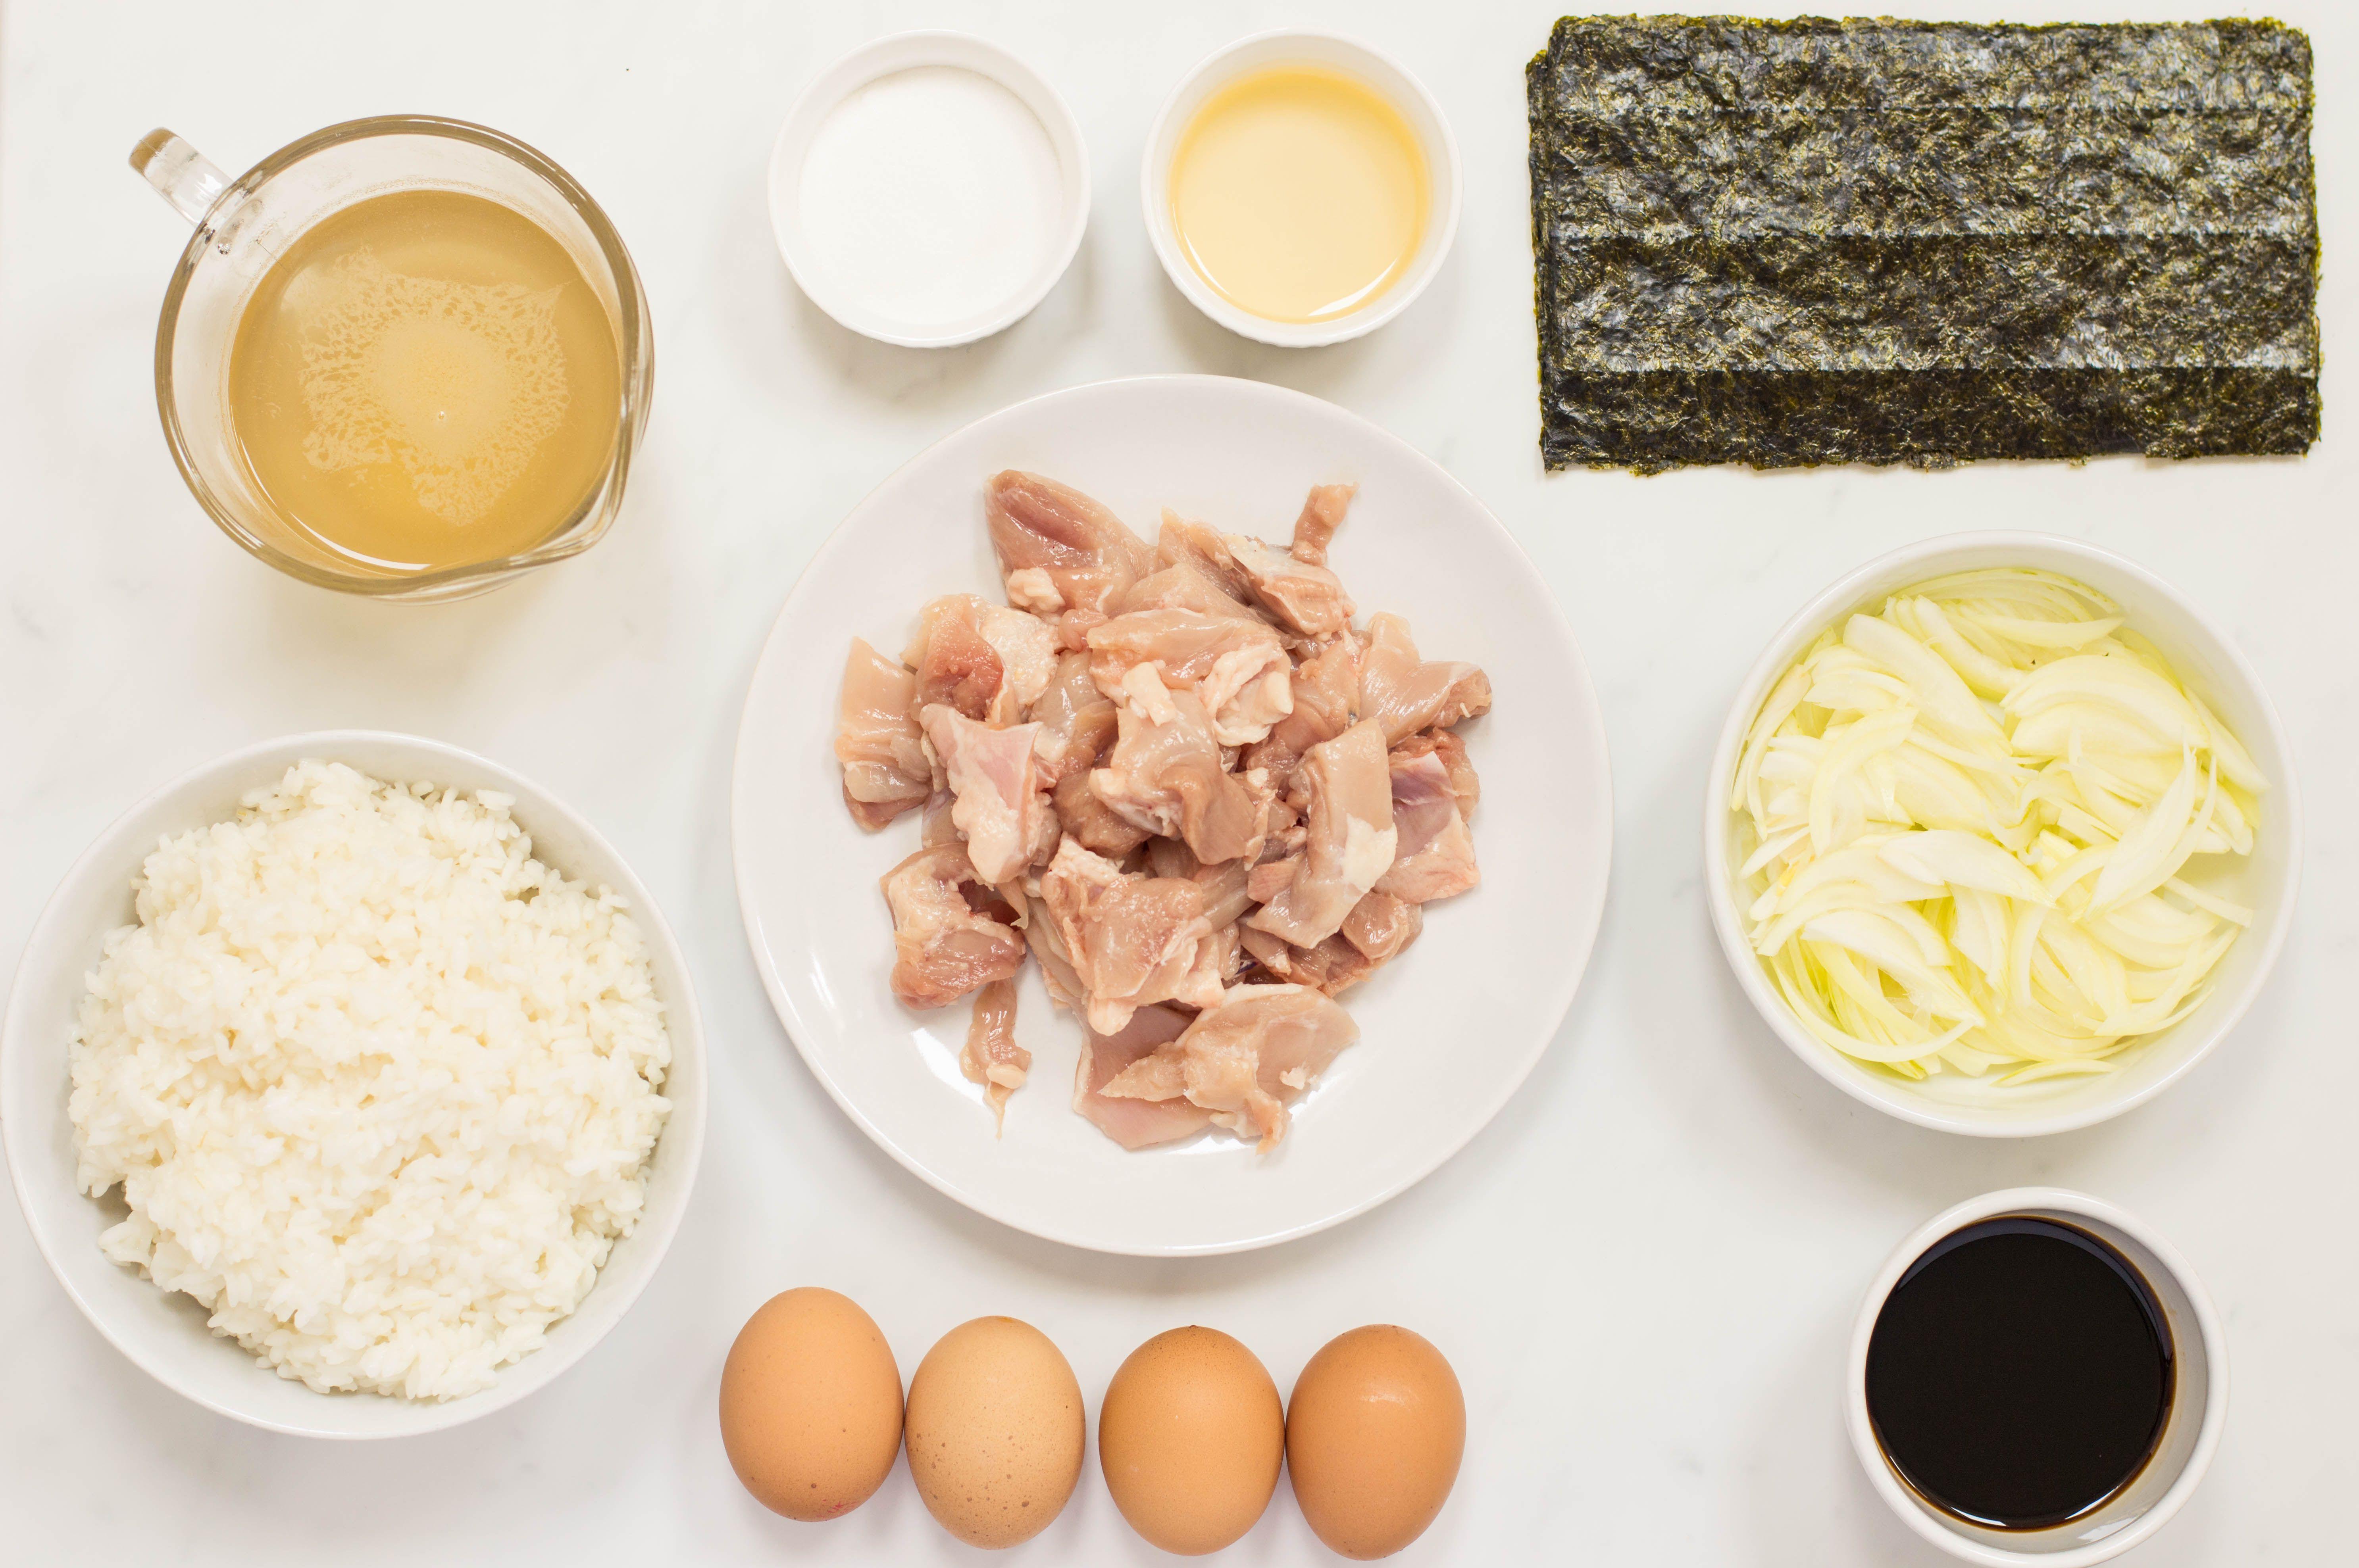 Ingredients for Oyakodon